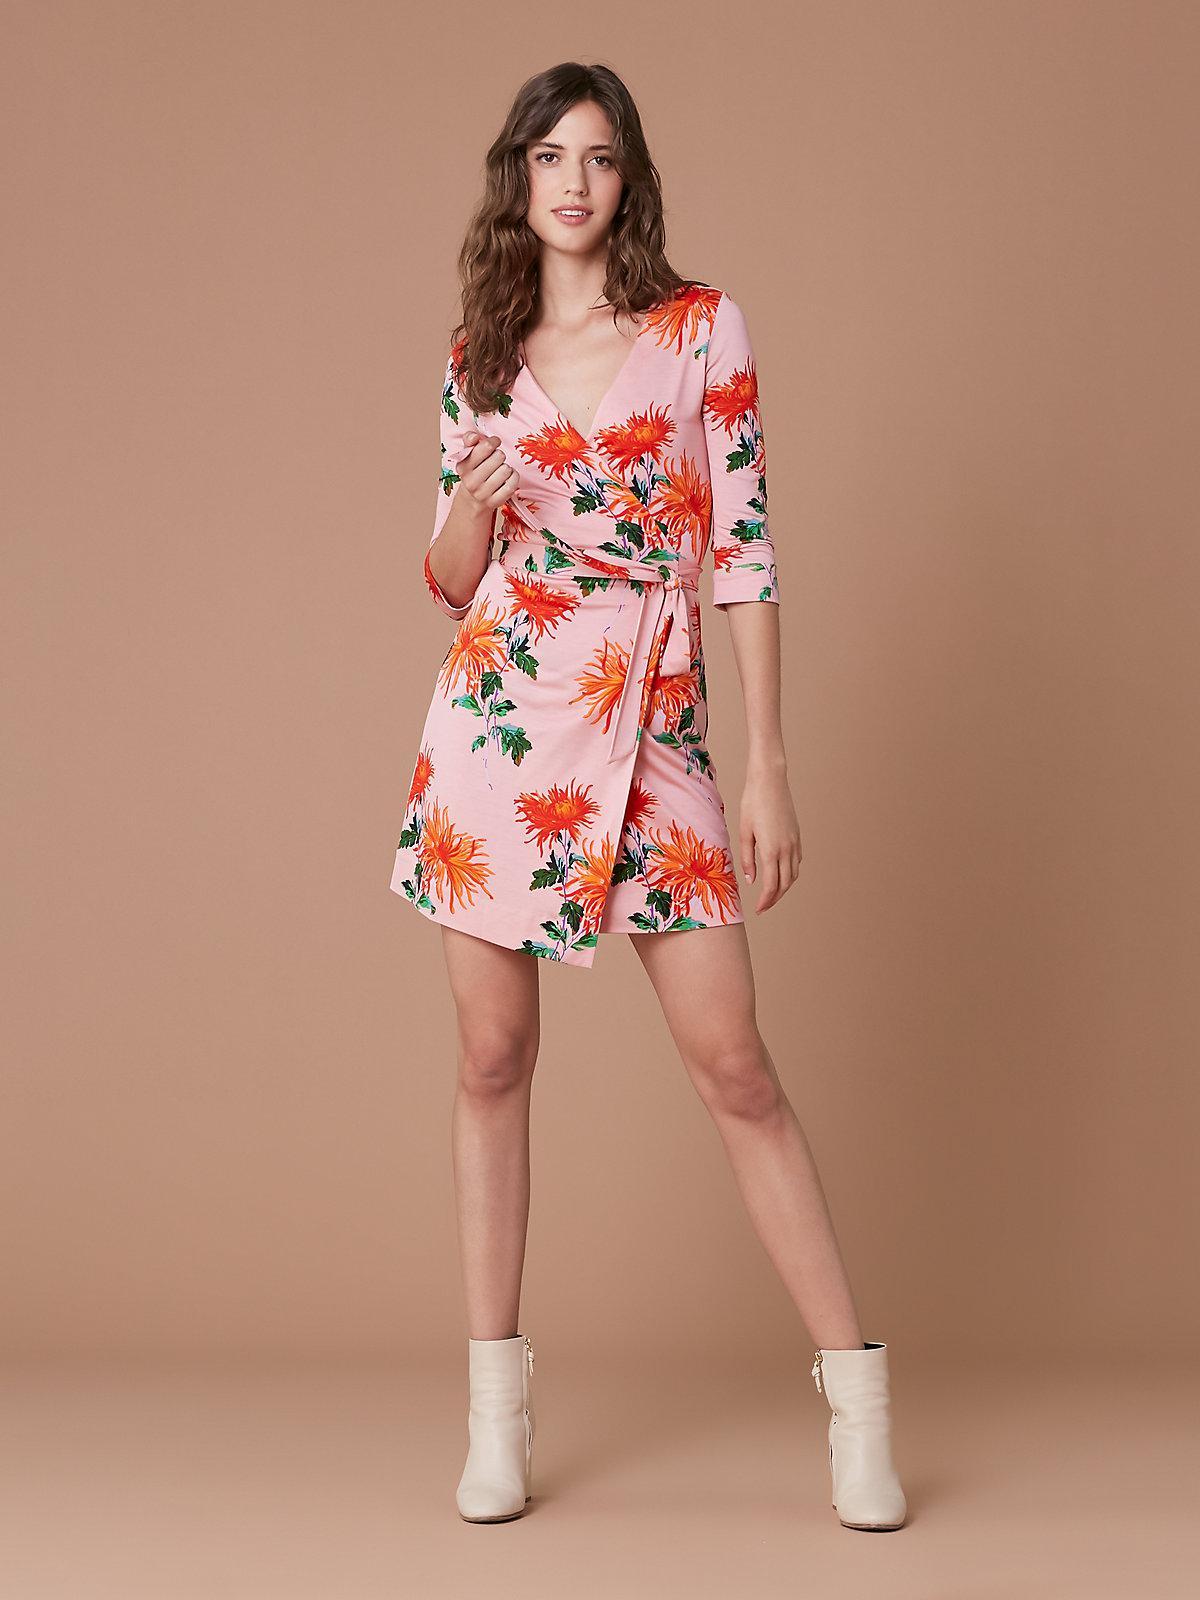 da1b742419b3 Lyst - Diane von Furstenberg New Julian Two Mini Wrap Dress in Pink